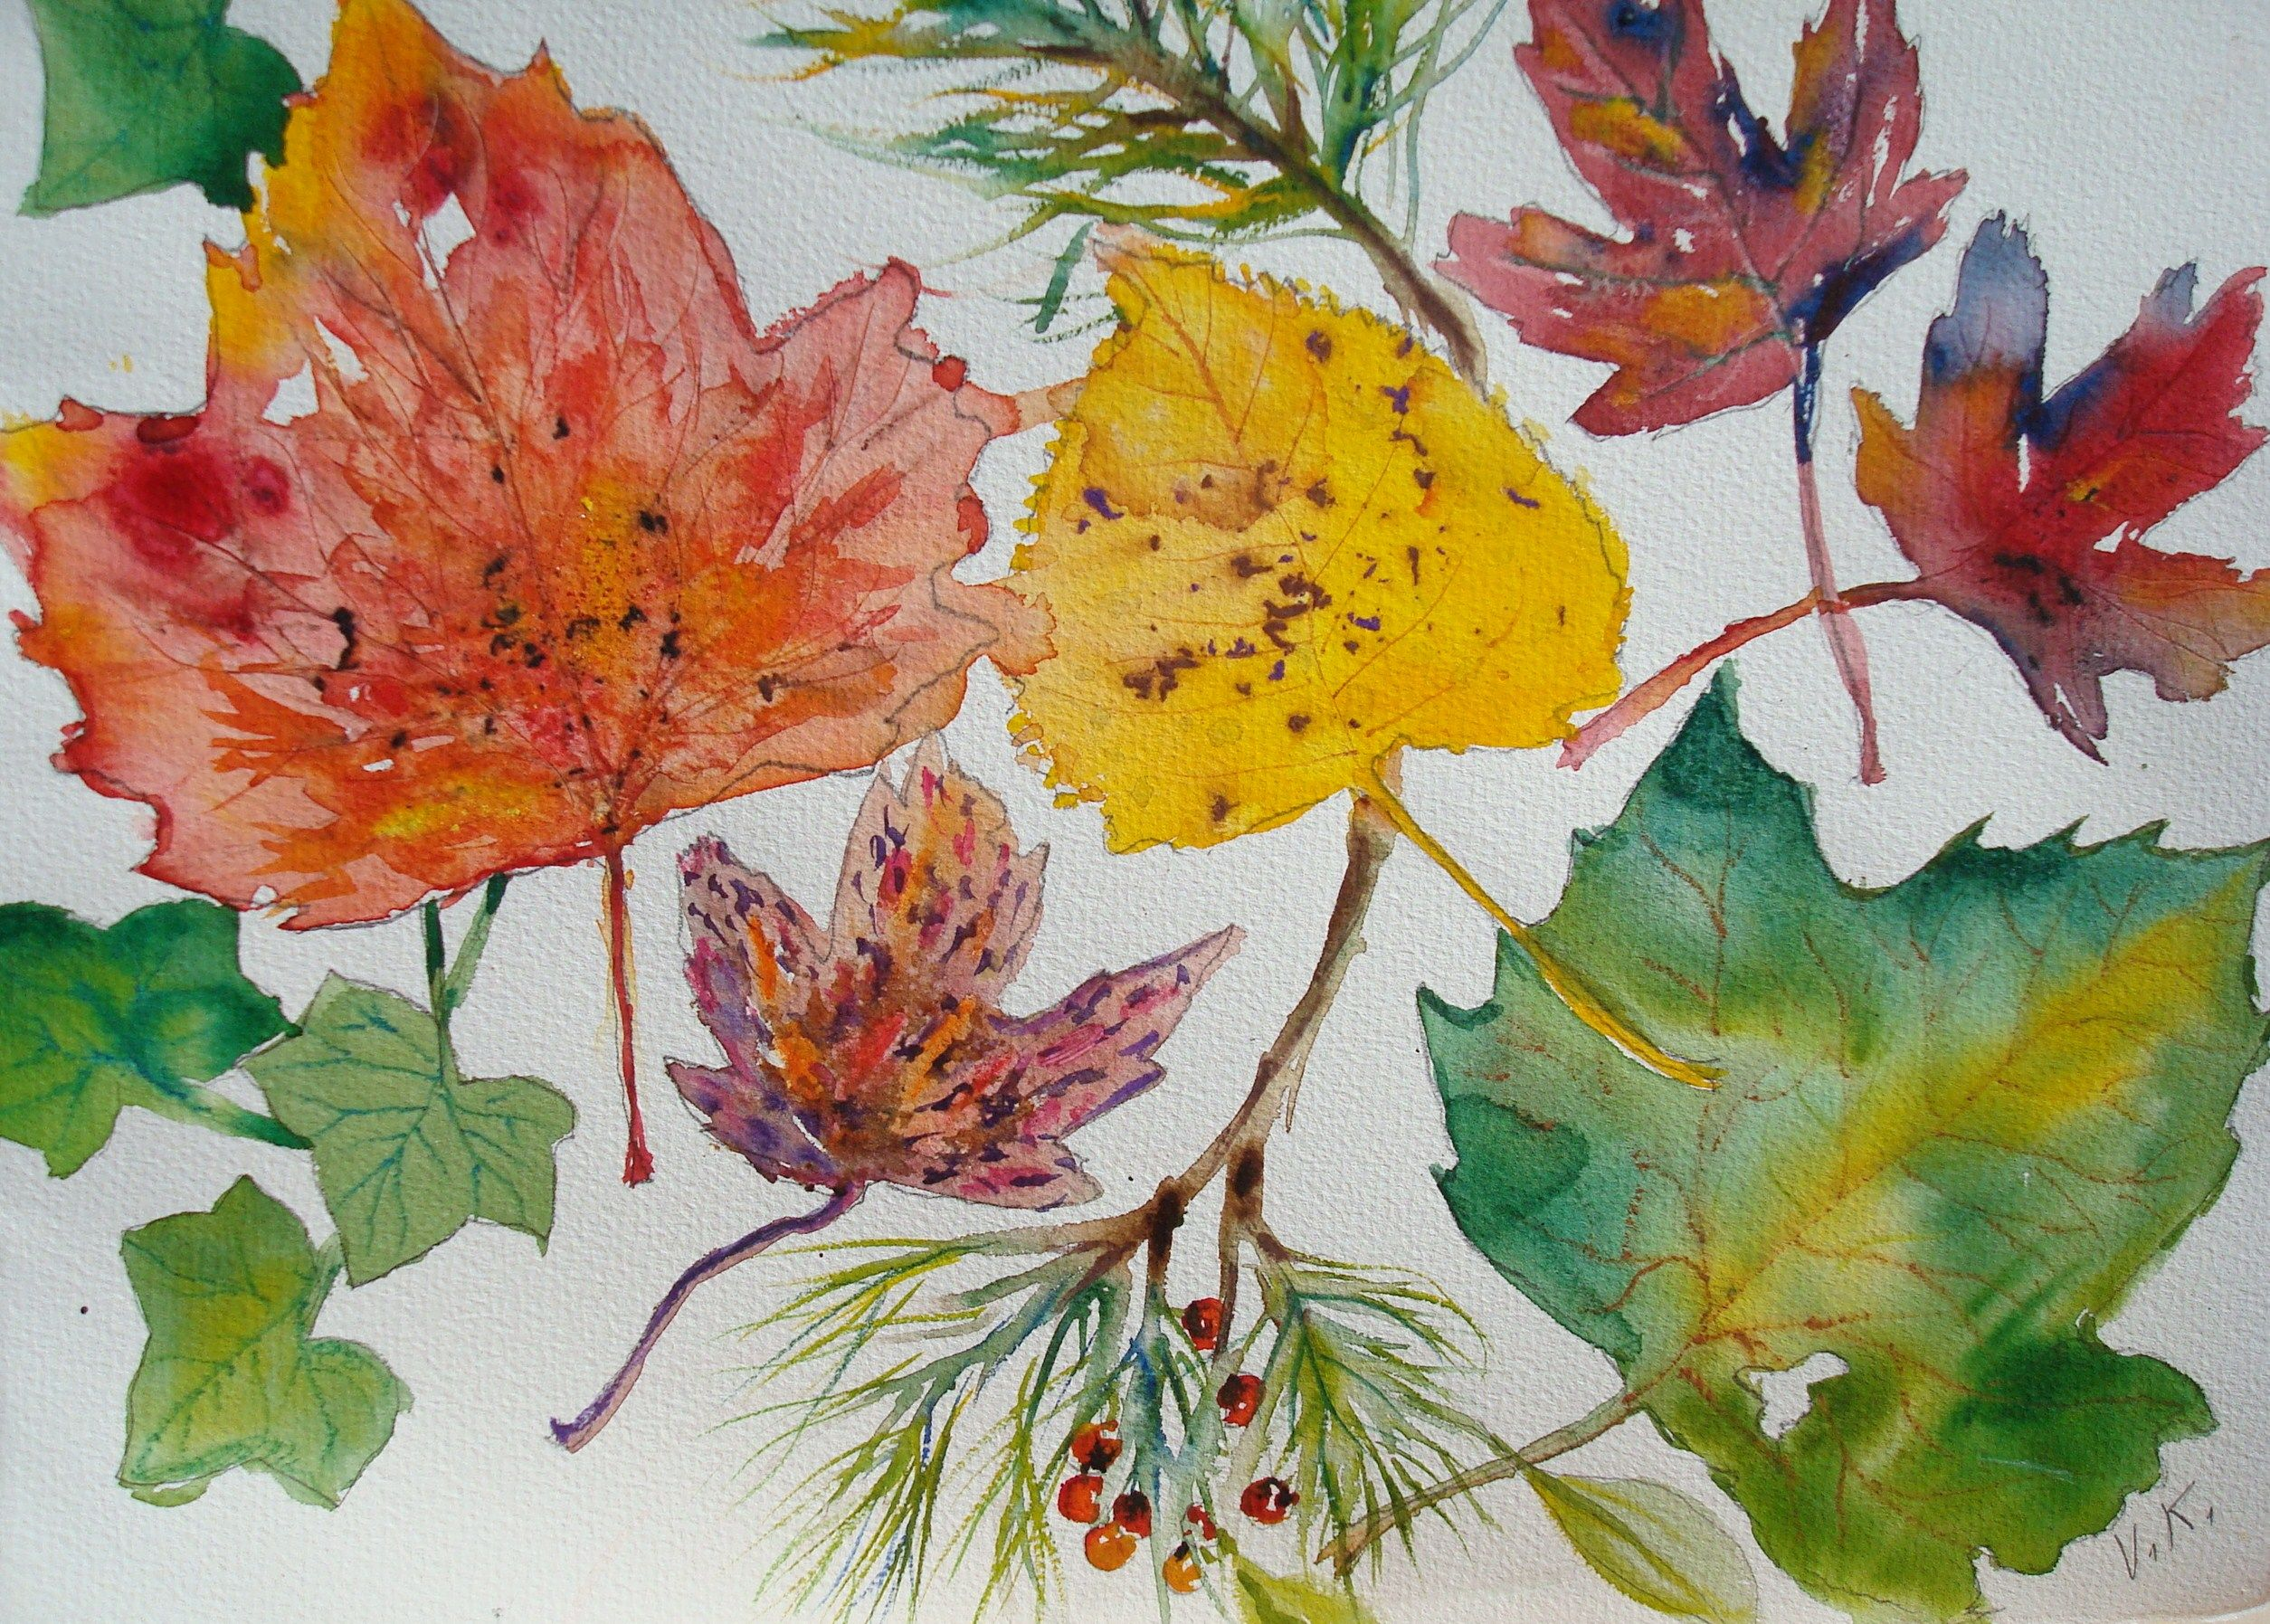 Paint Fall Leaves in Watercolor | watercolor | Watercolor